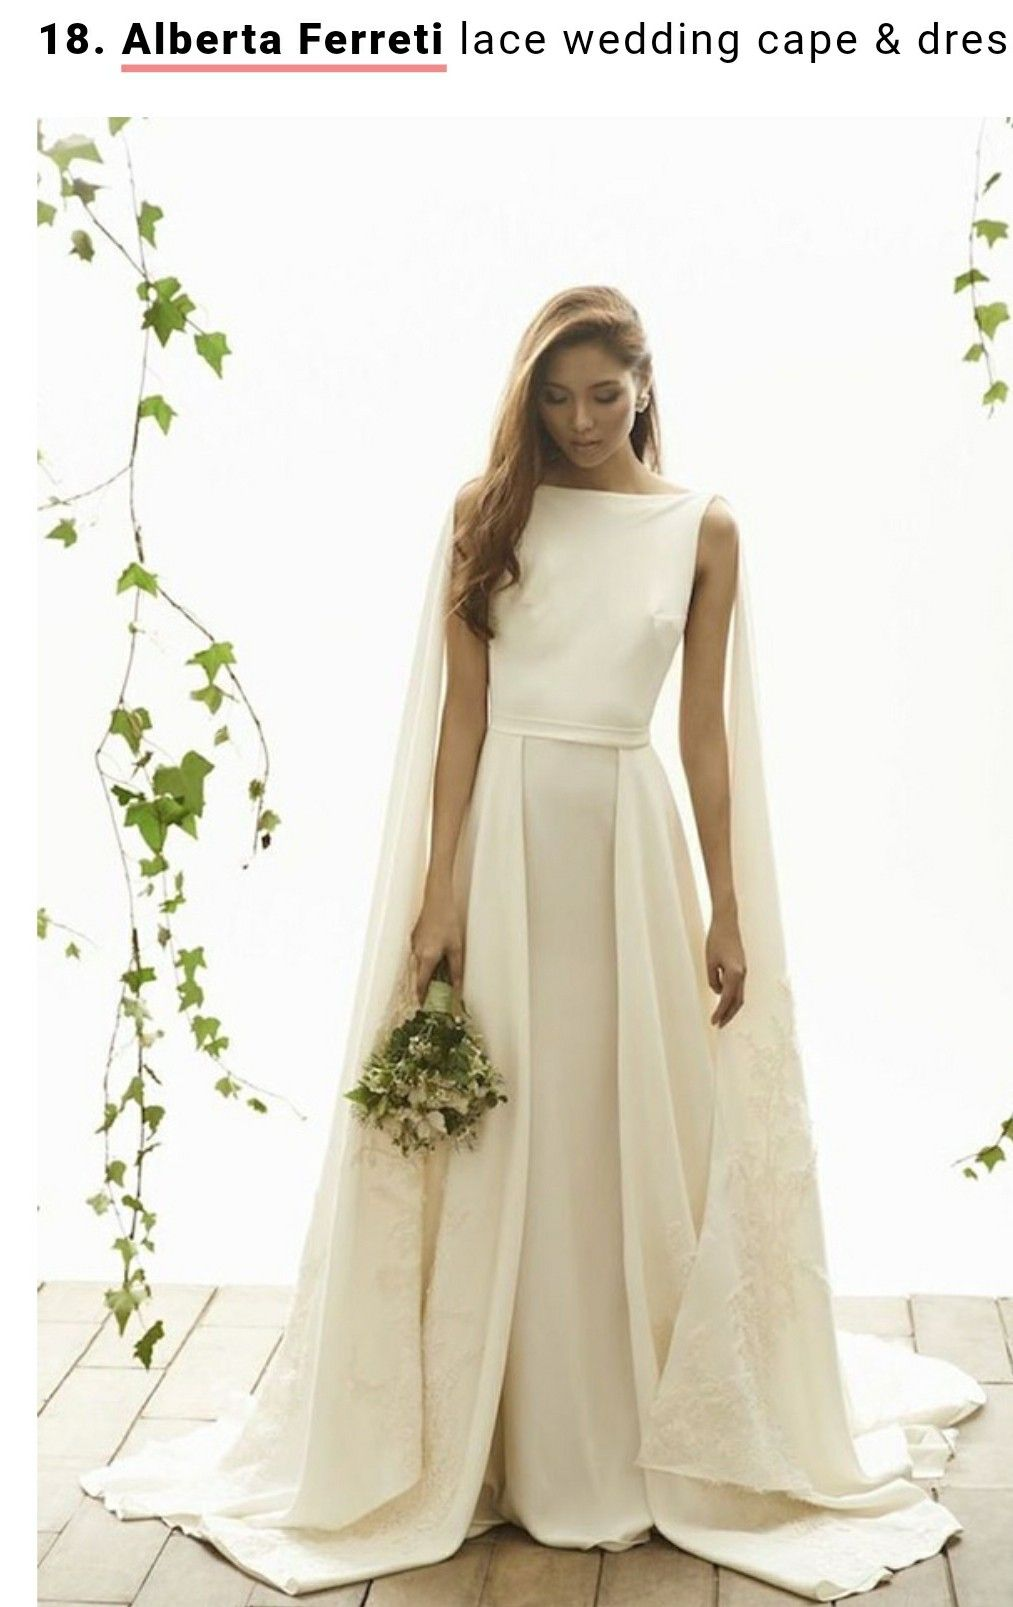 Pin by sara matthiasdottir on bb fun pinterest wedding dress